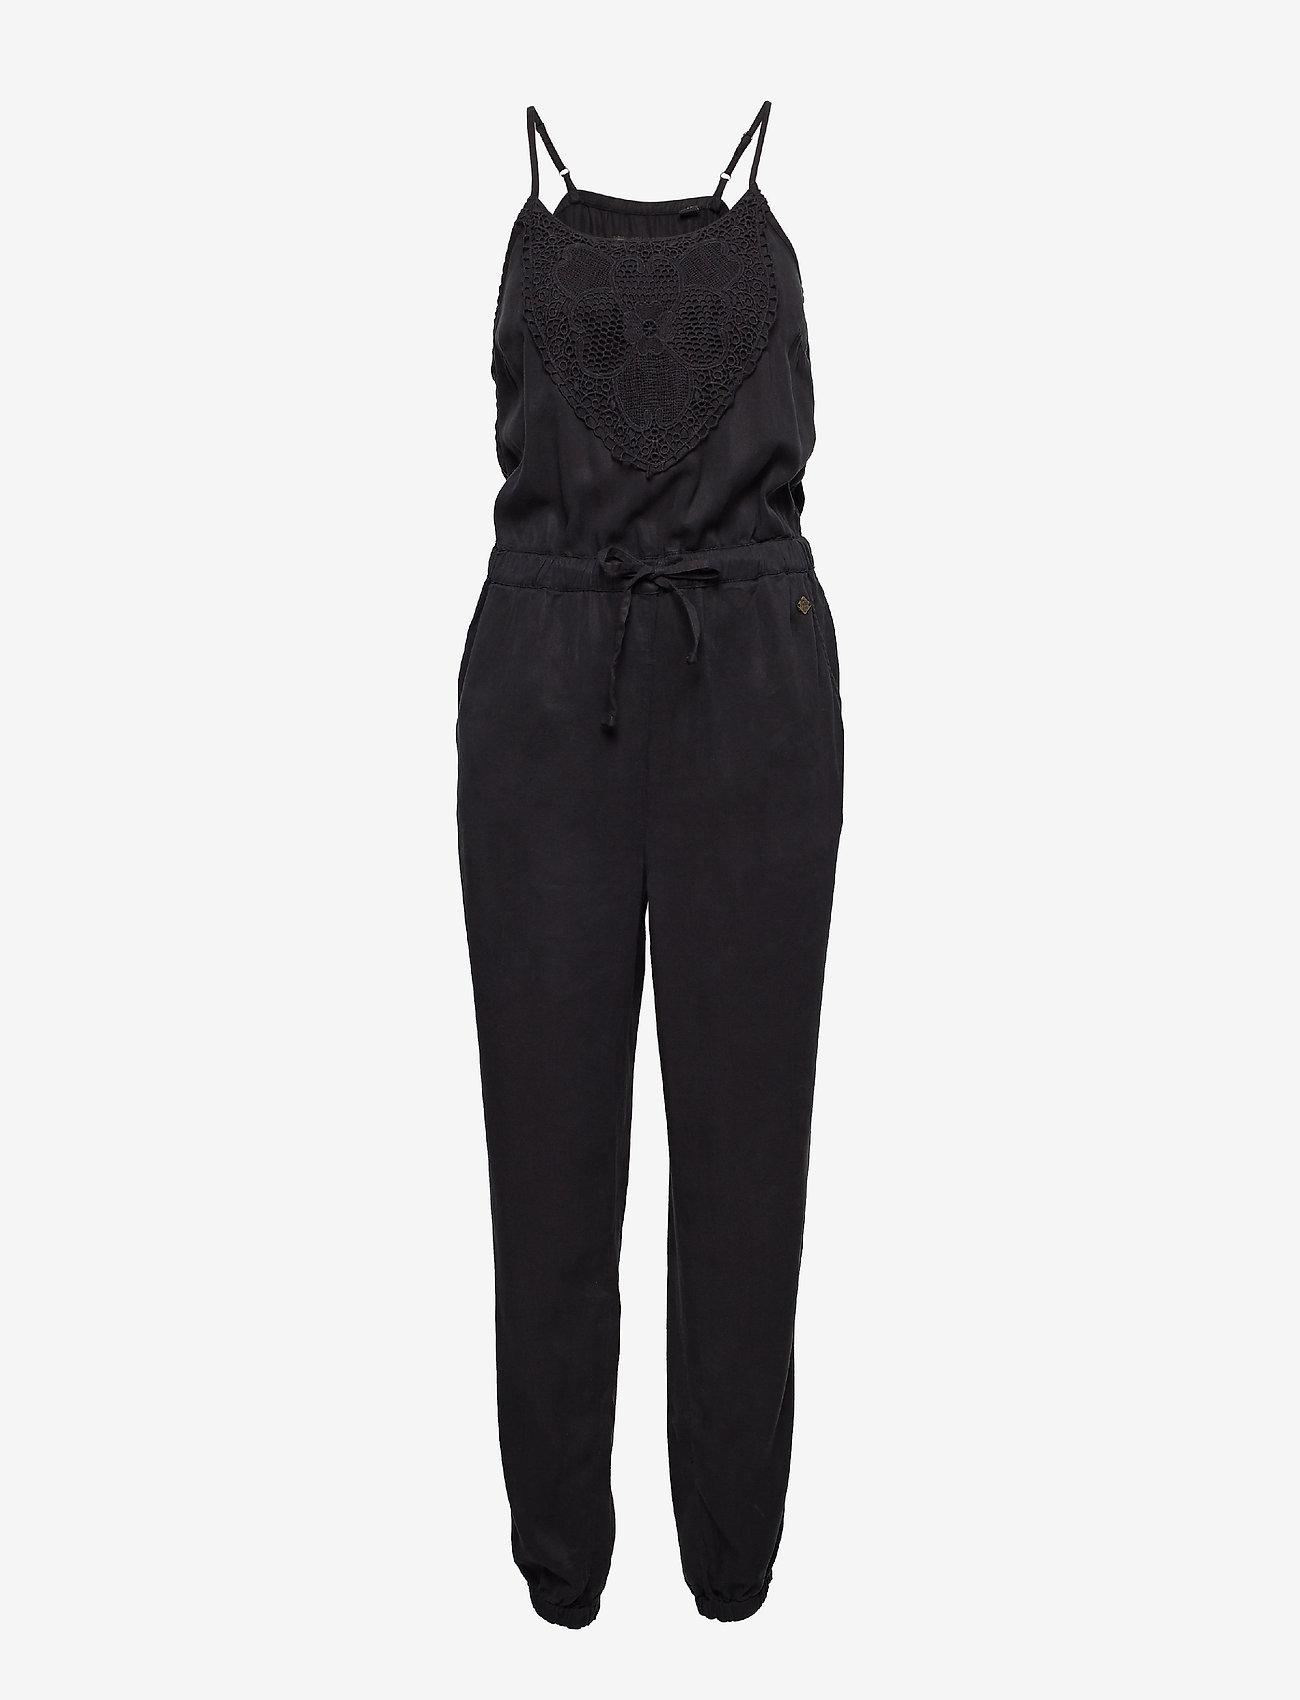 Superdry - REAH BOHO JUMPSUIT - jumpsuits - washed black - 0